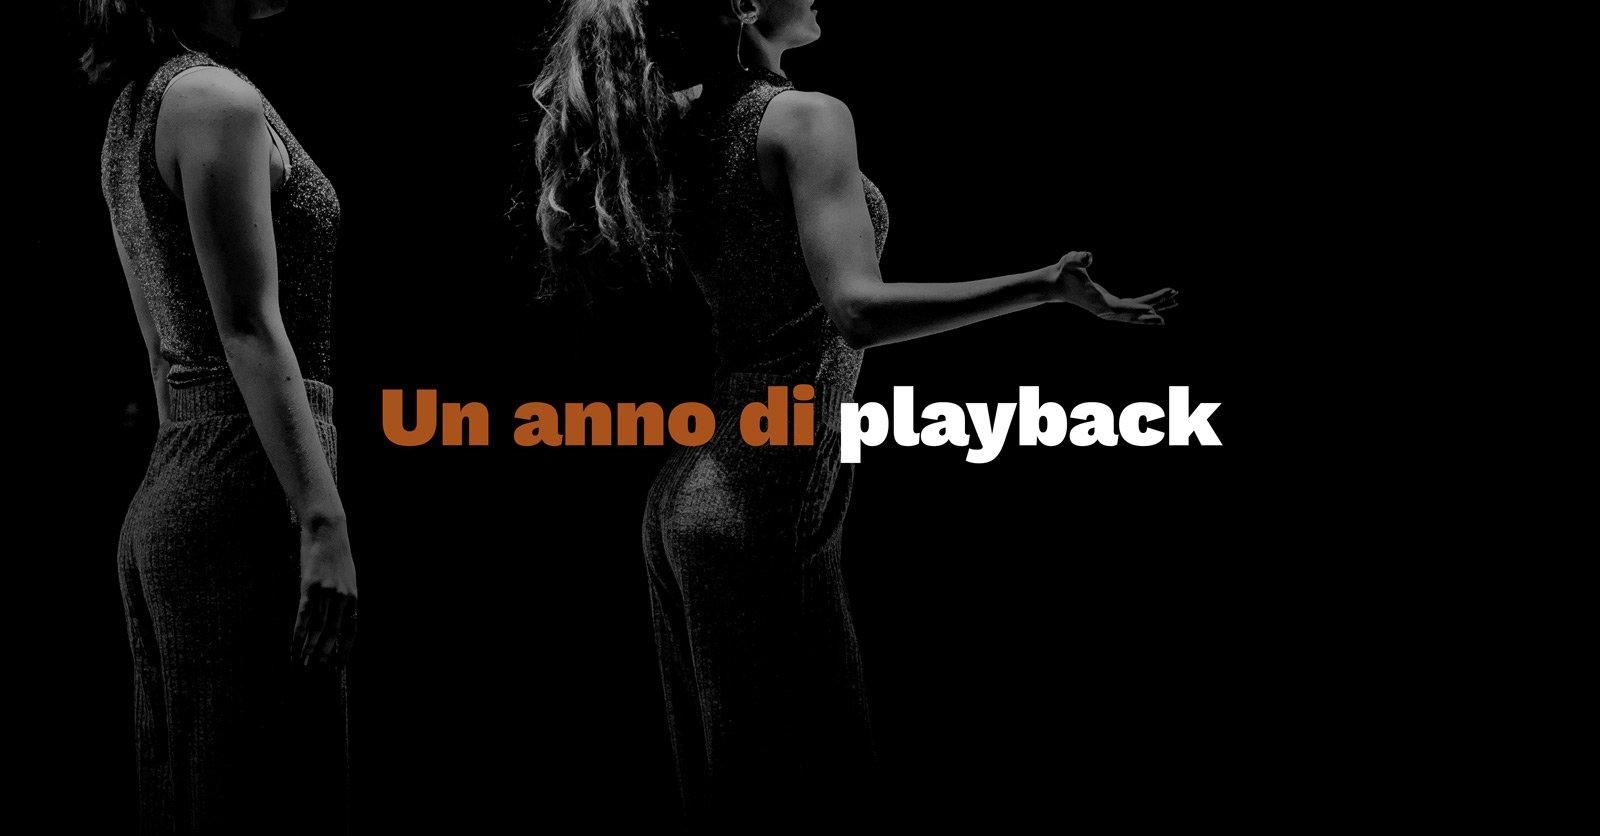 Playback Thatre Ragazzi